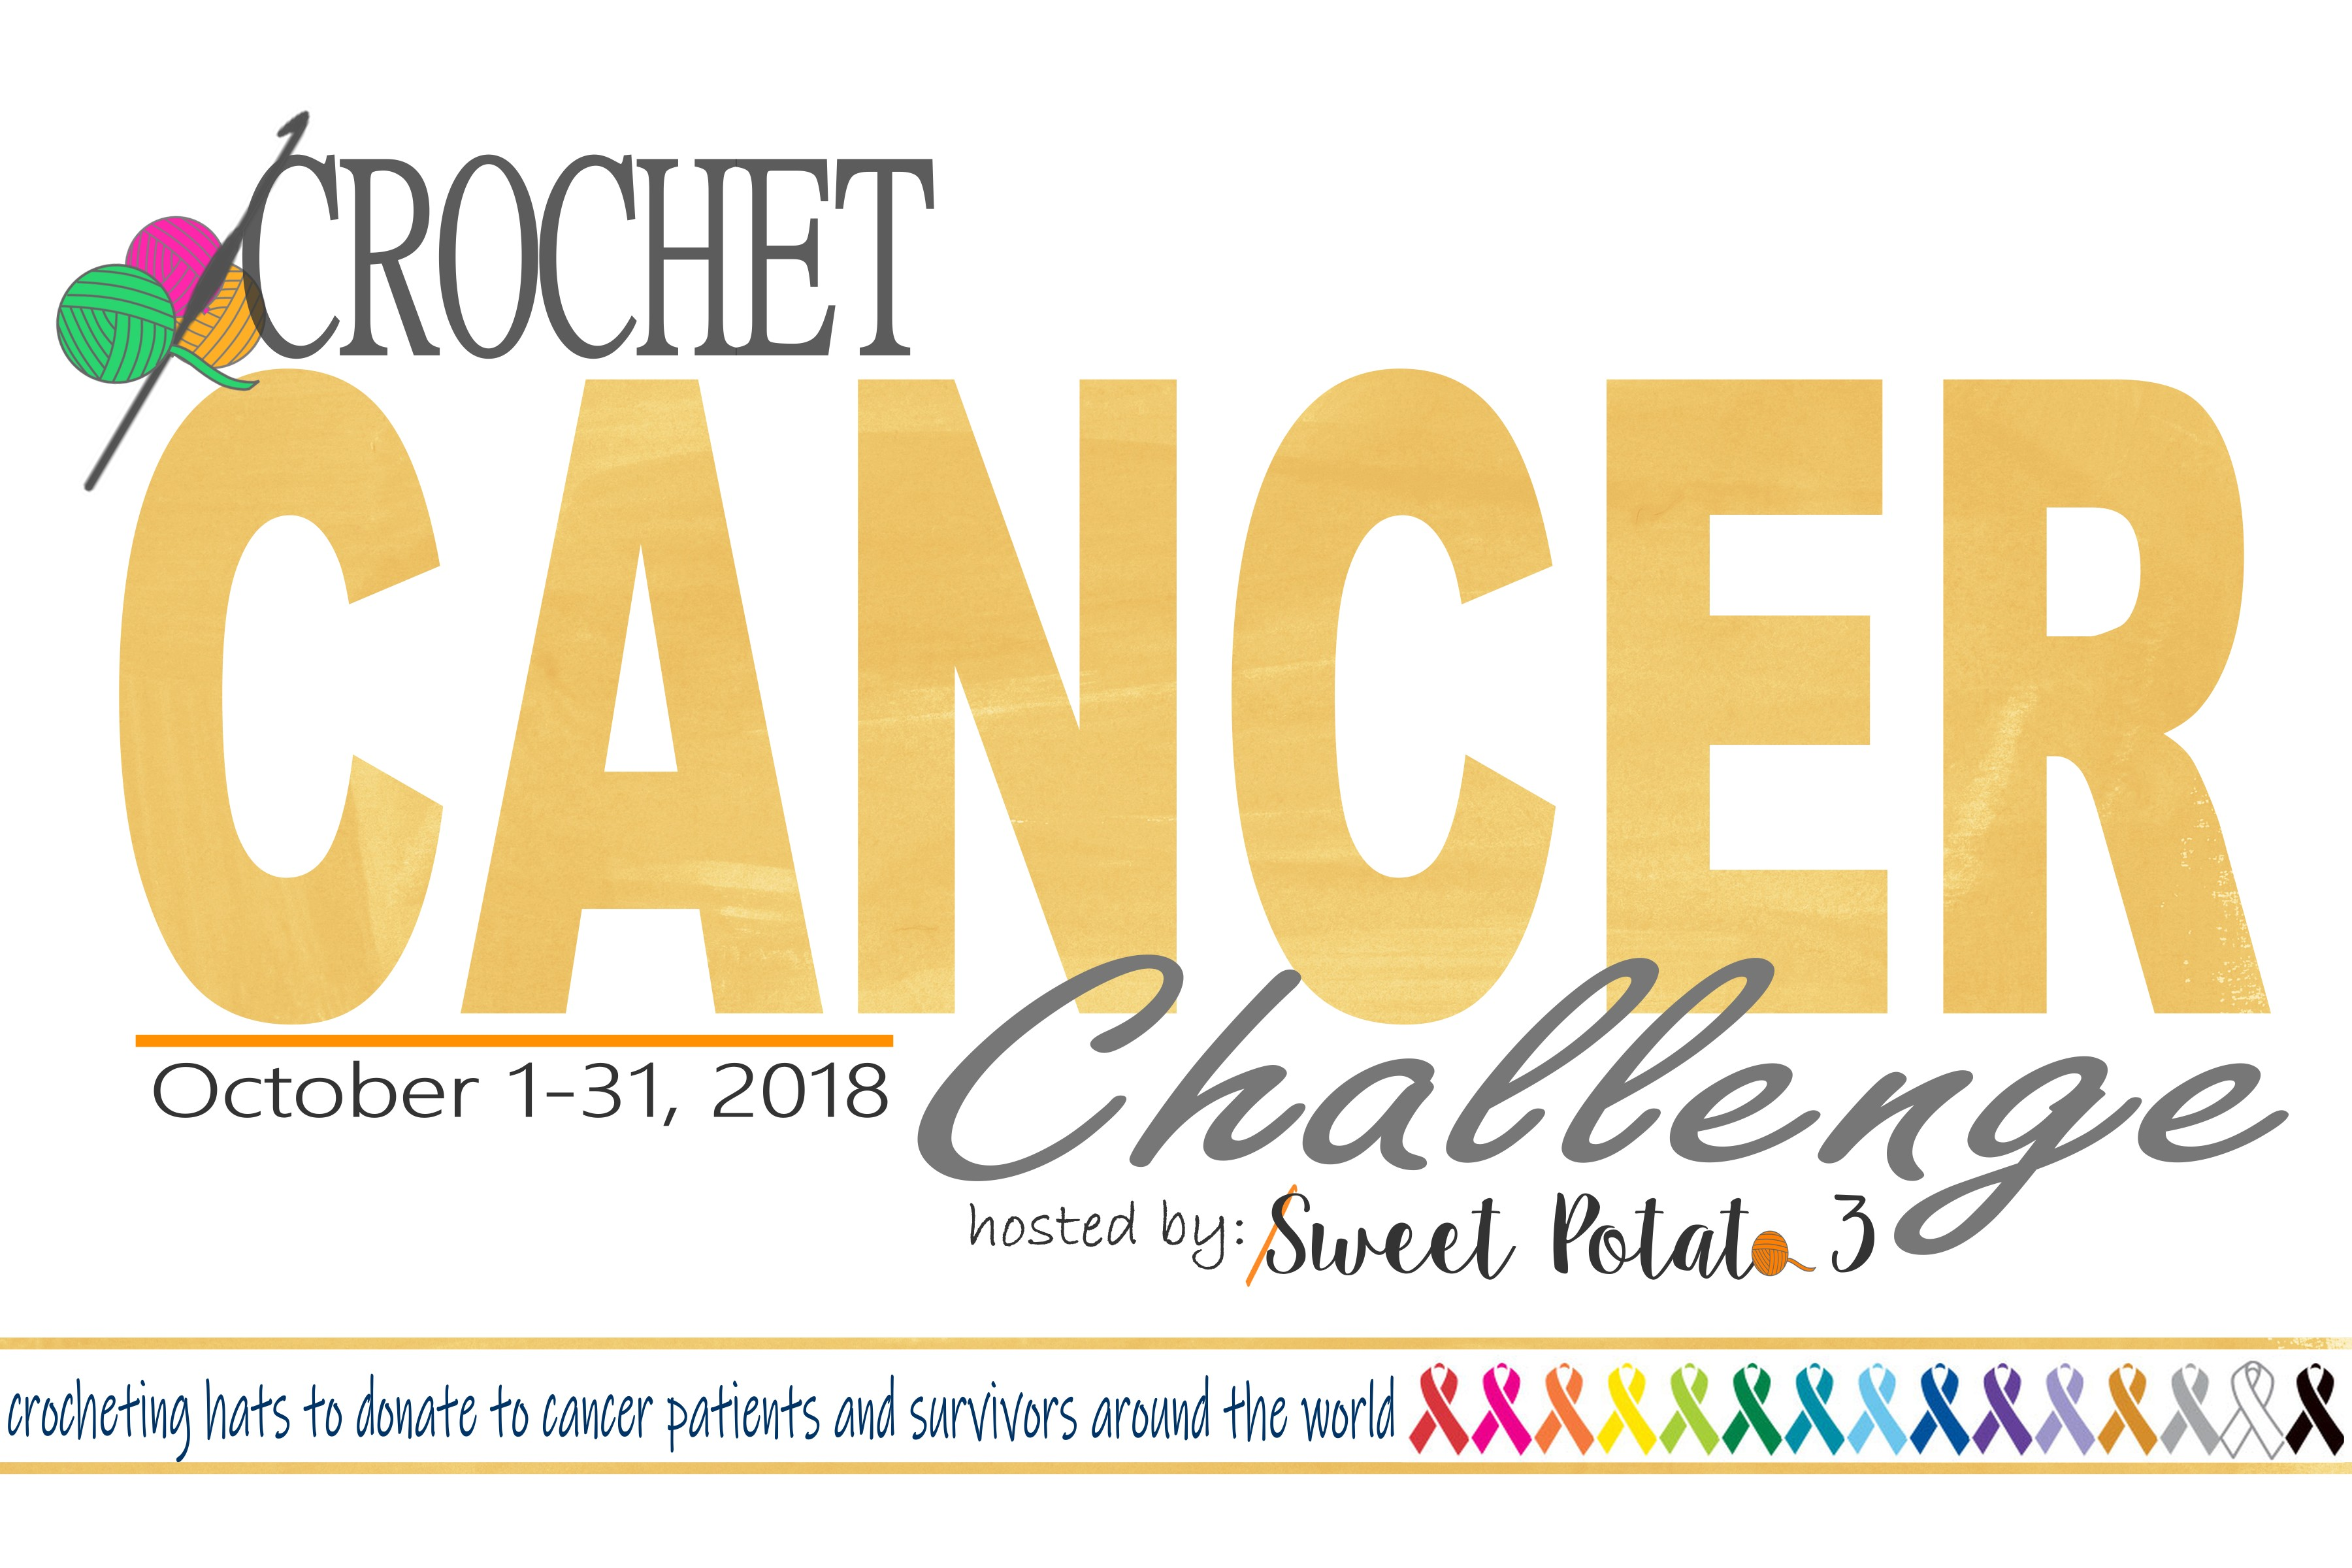 Week 2: Cancer Challenge Last Chance